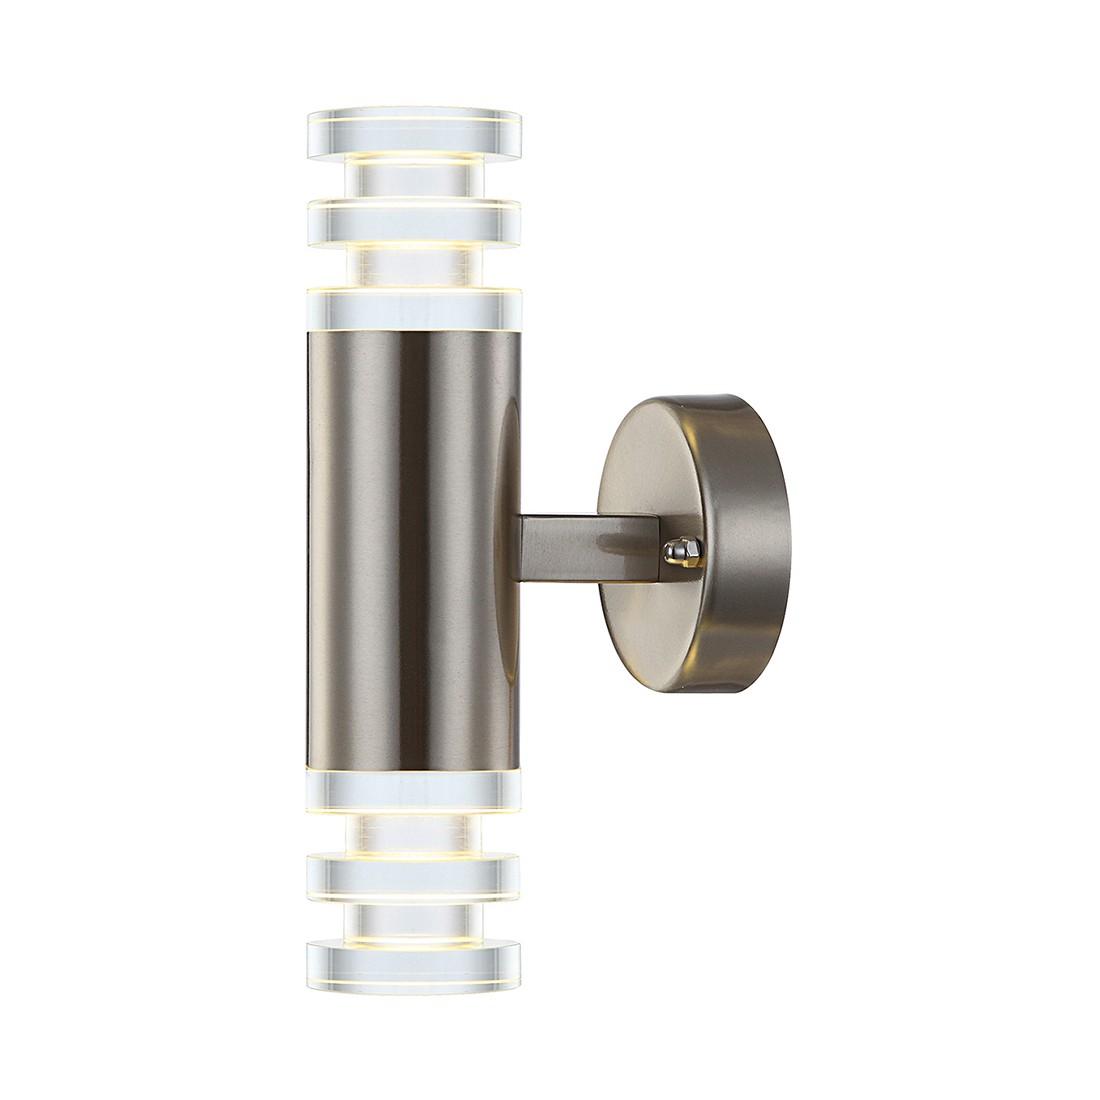 LED-Außenleuchte Edelstahl IV by Globo ● Stahl/Glas ● Silber- Globo Lighting A+